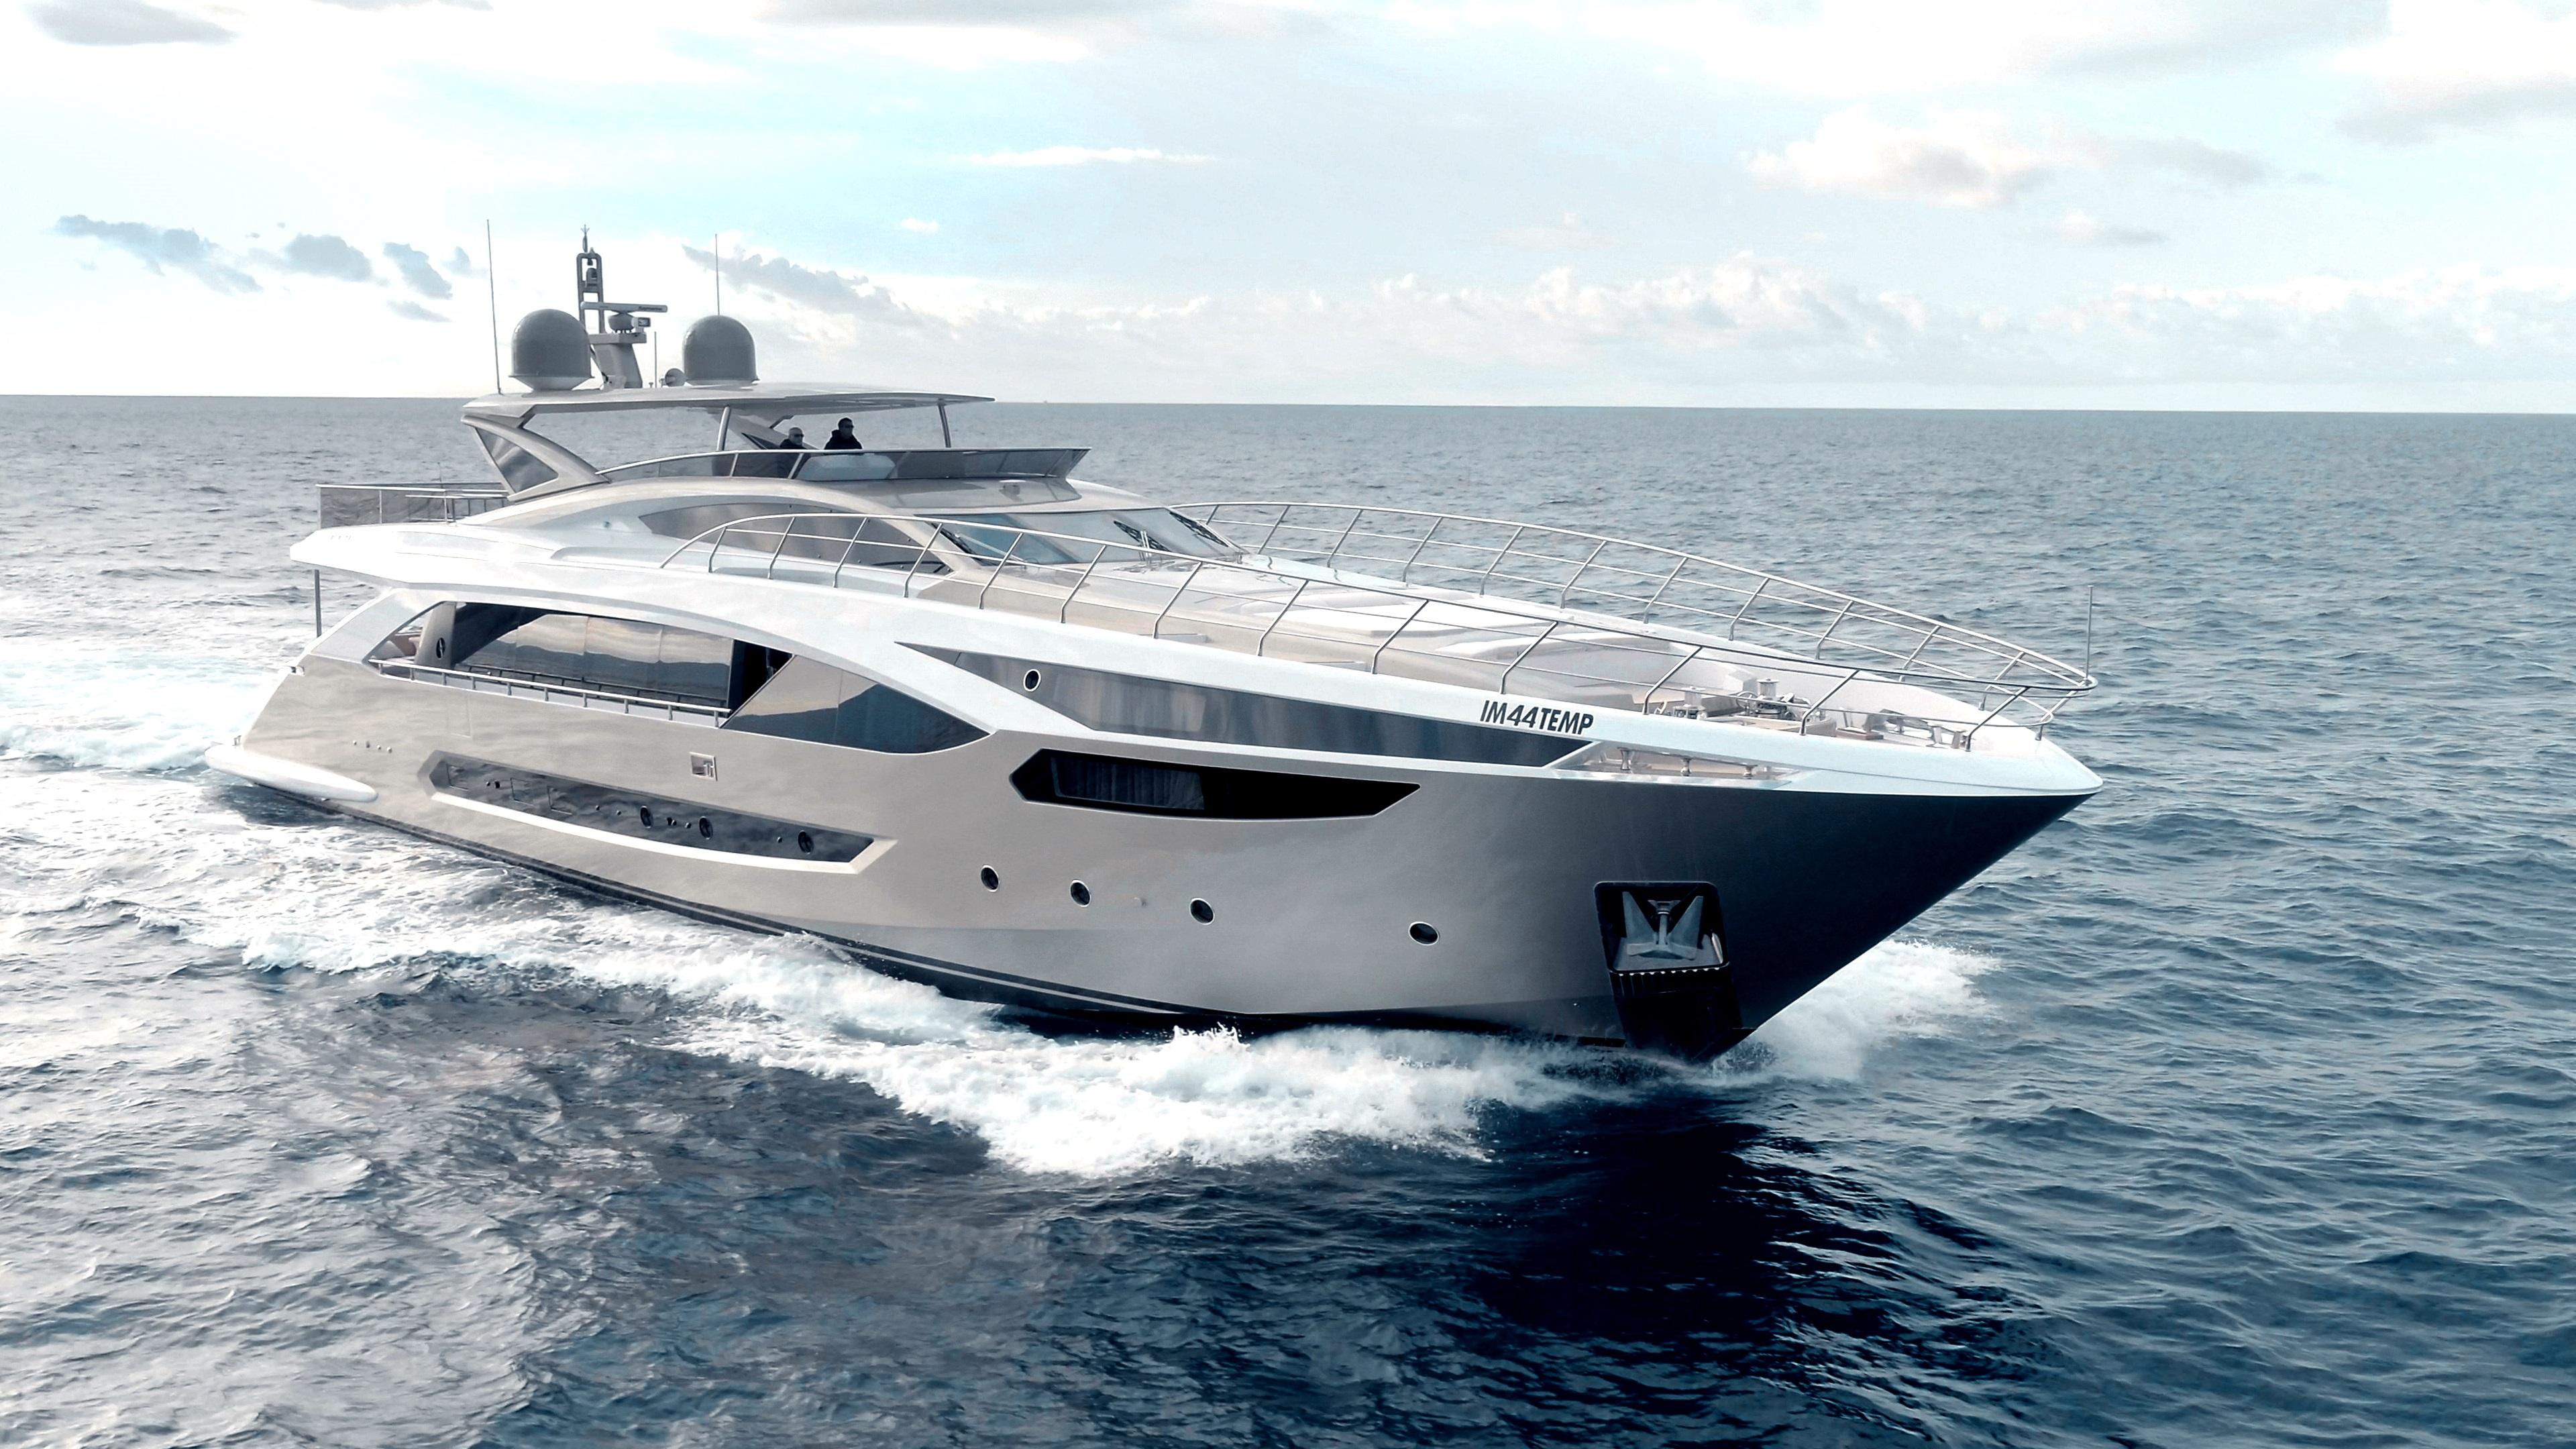 Amer Yachts - Amer 110 Unique